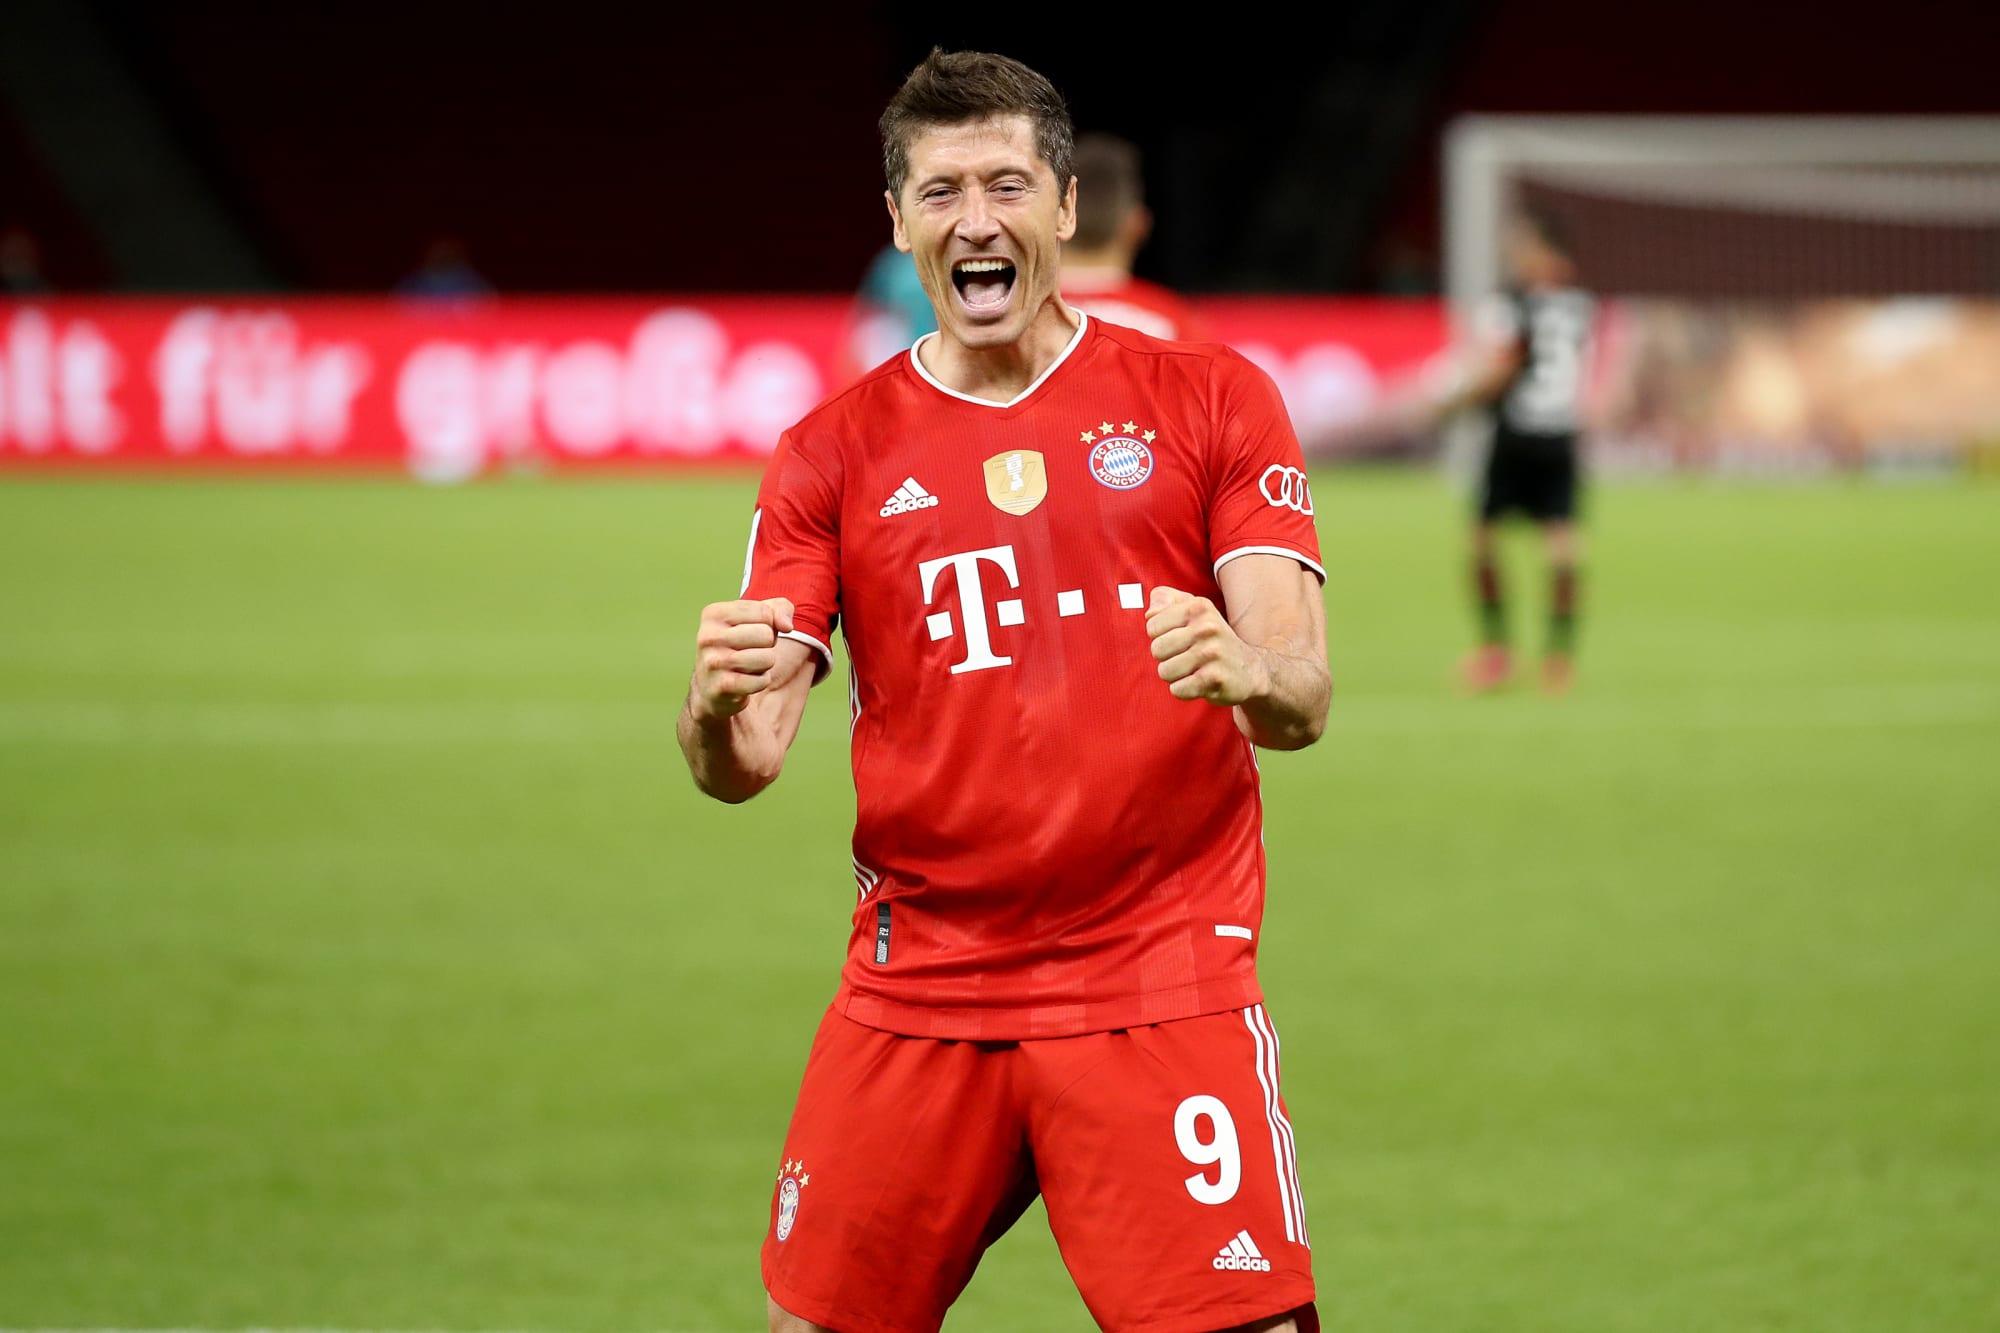 Bayern Munich: Robert Lewandowski unlikely to leave in summer